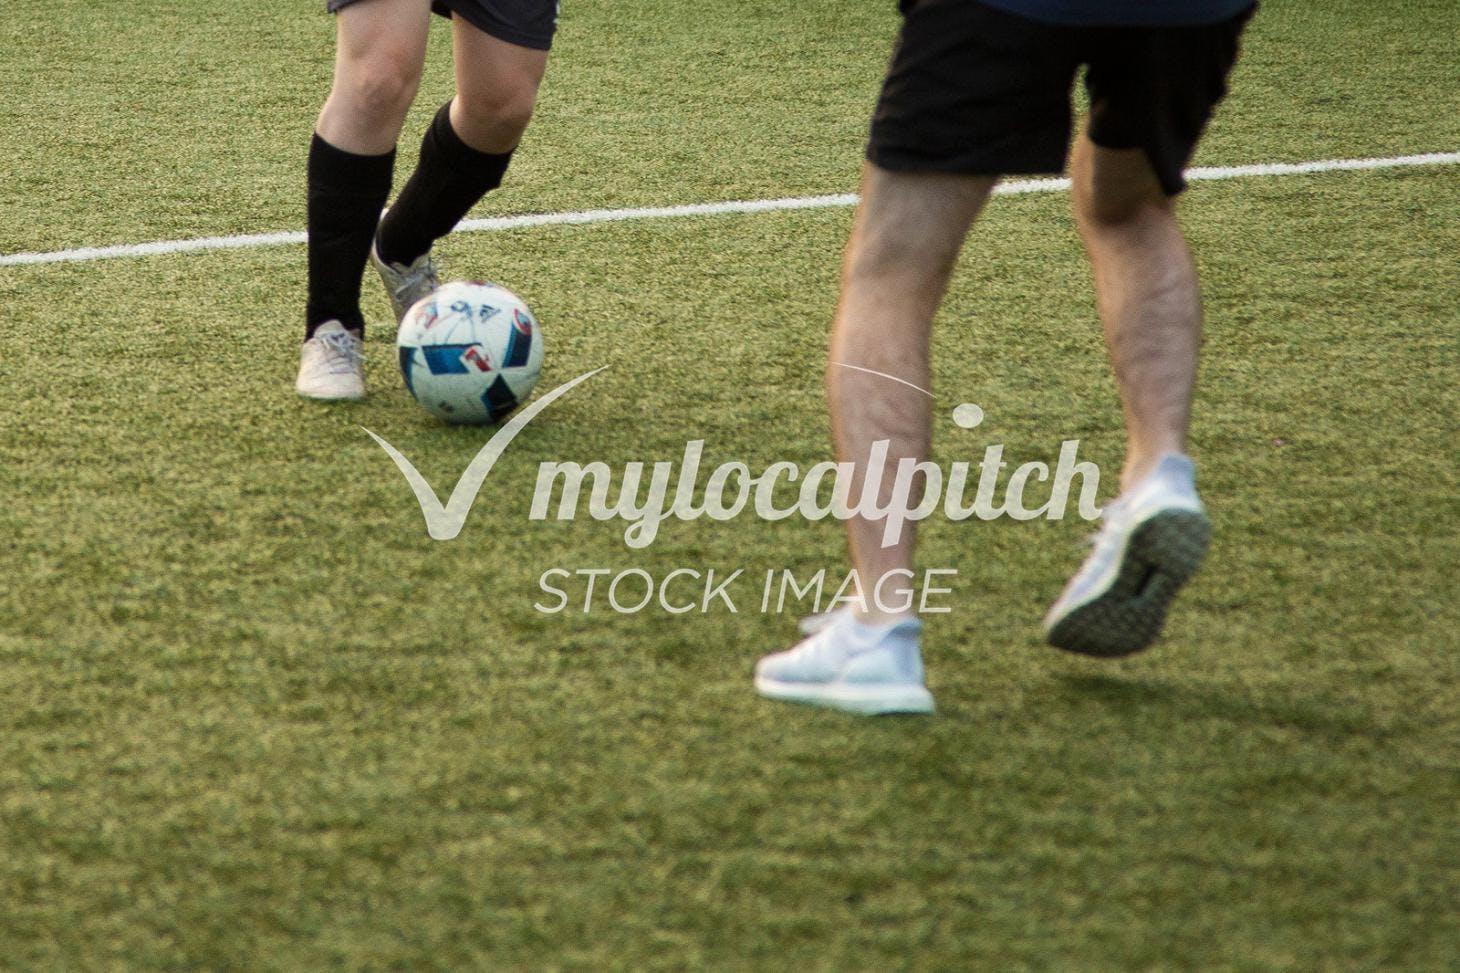 Portmarnock Sports & Leisure Club 5 a side | Astroturf football pitch